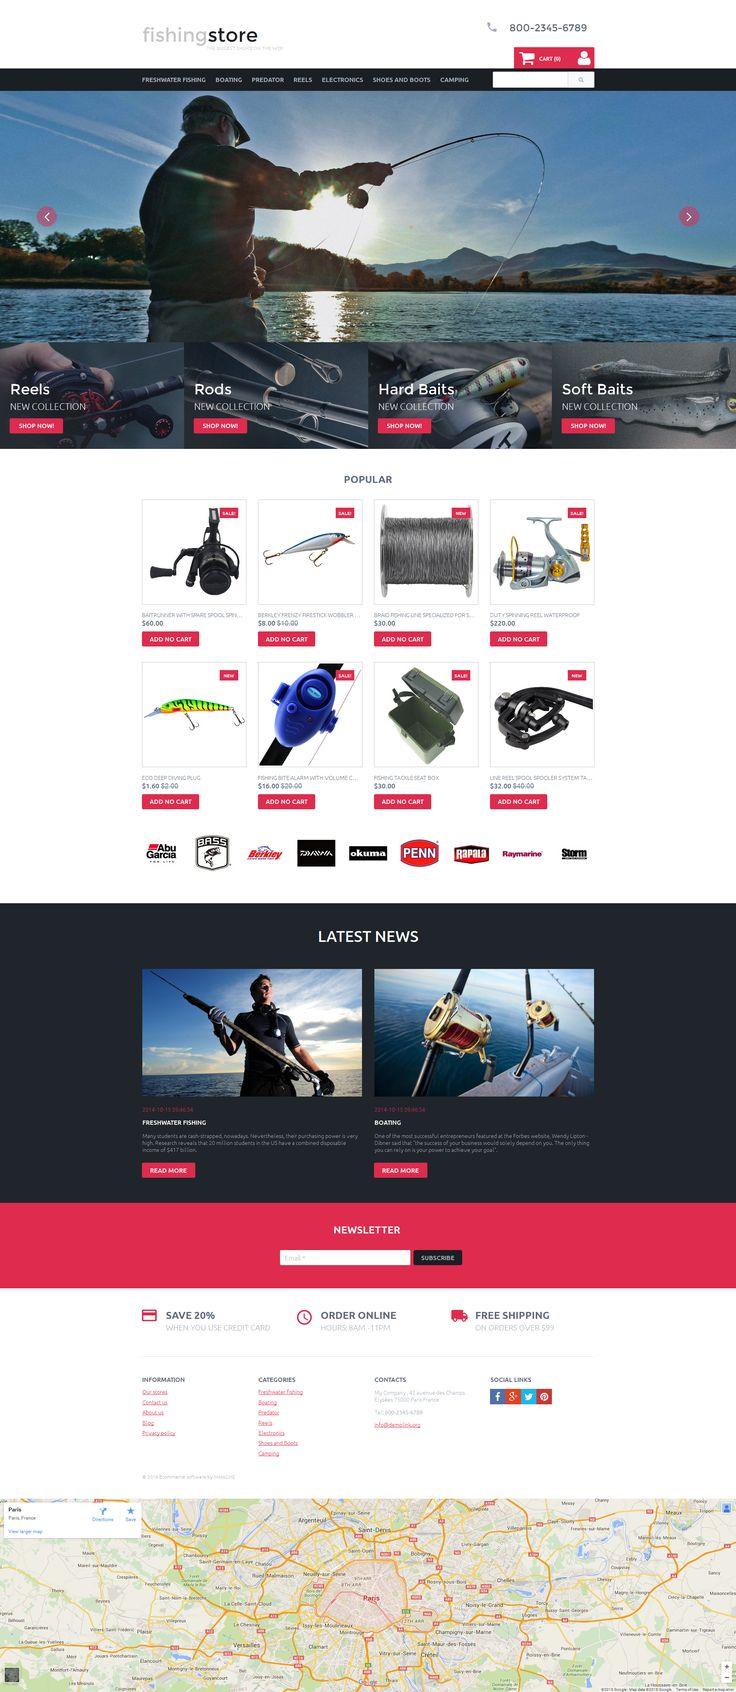 Fishing Responsive MotoCMS Ecommerce Template #58488 http://www.templatemonster.com/motocms-ecommerce-templates/fishing-responsive-motocms-ecommerce-template-58488.html